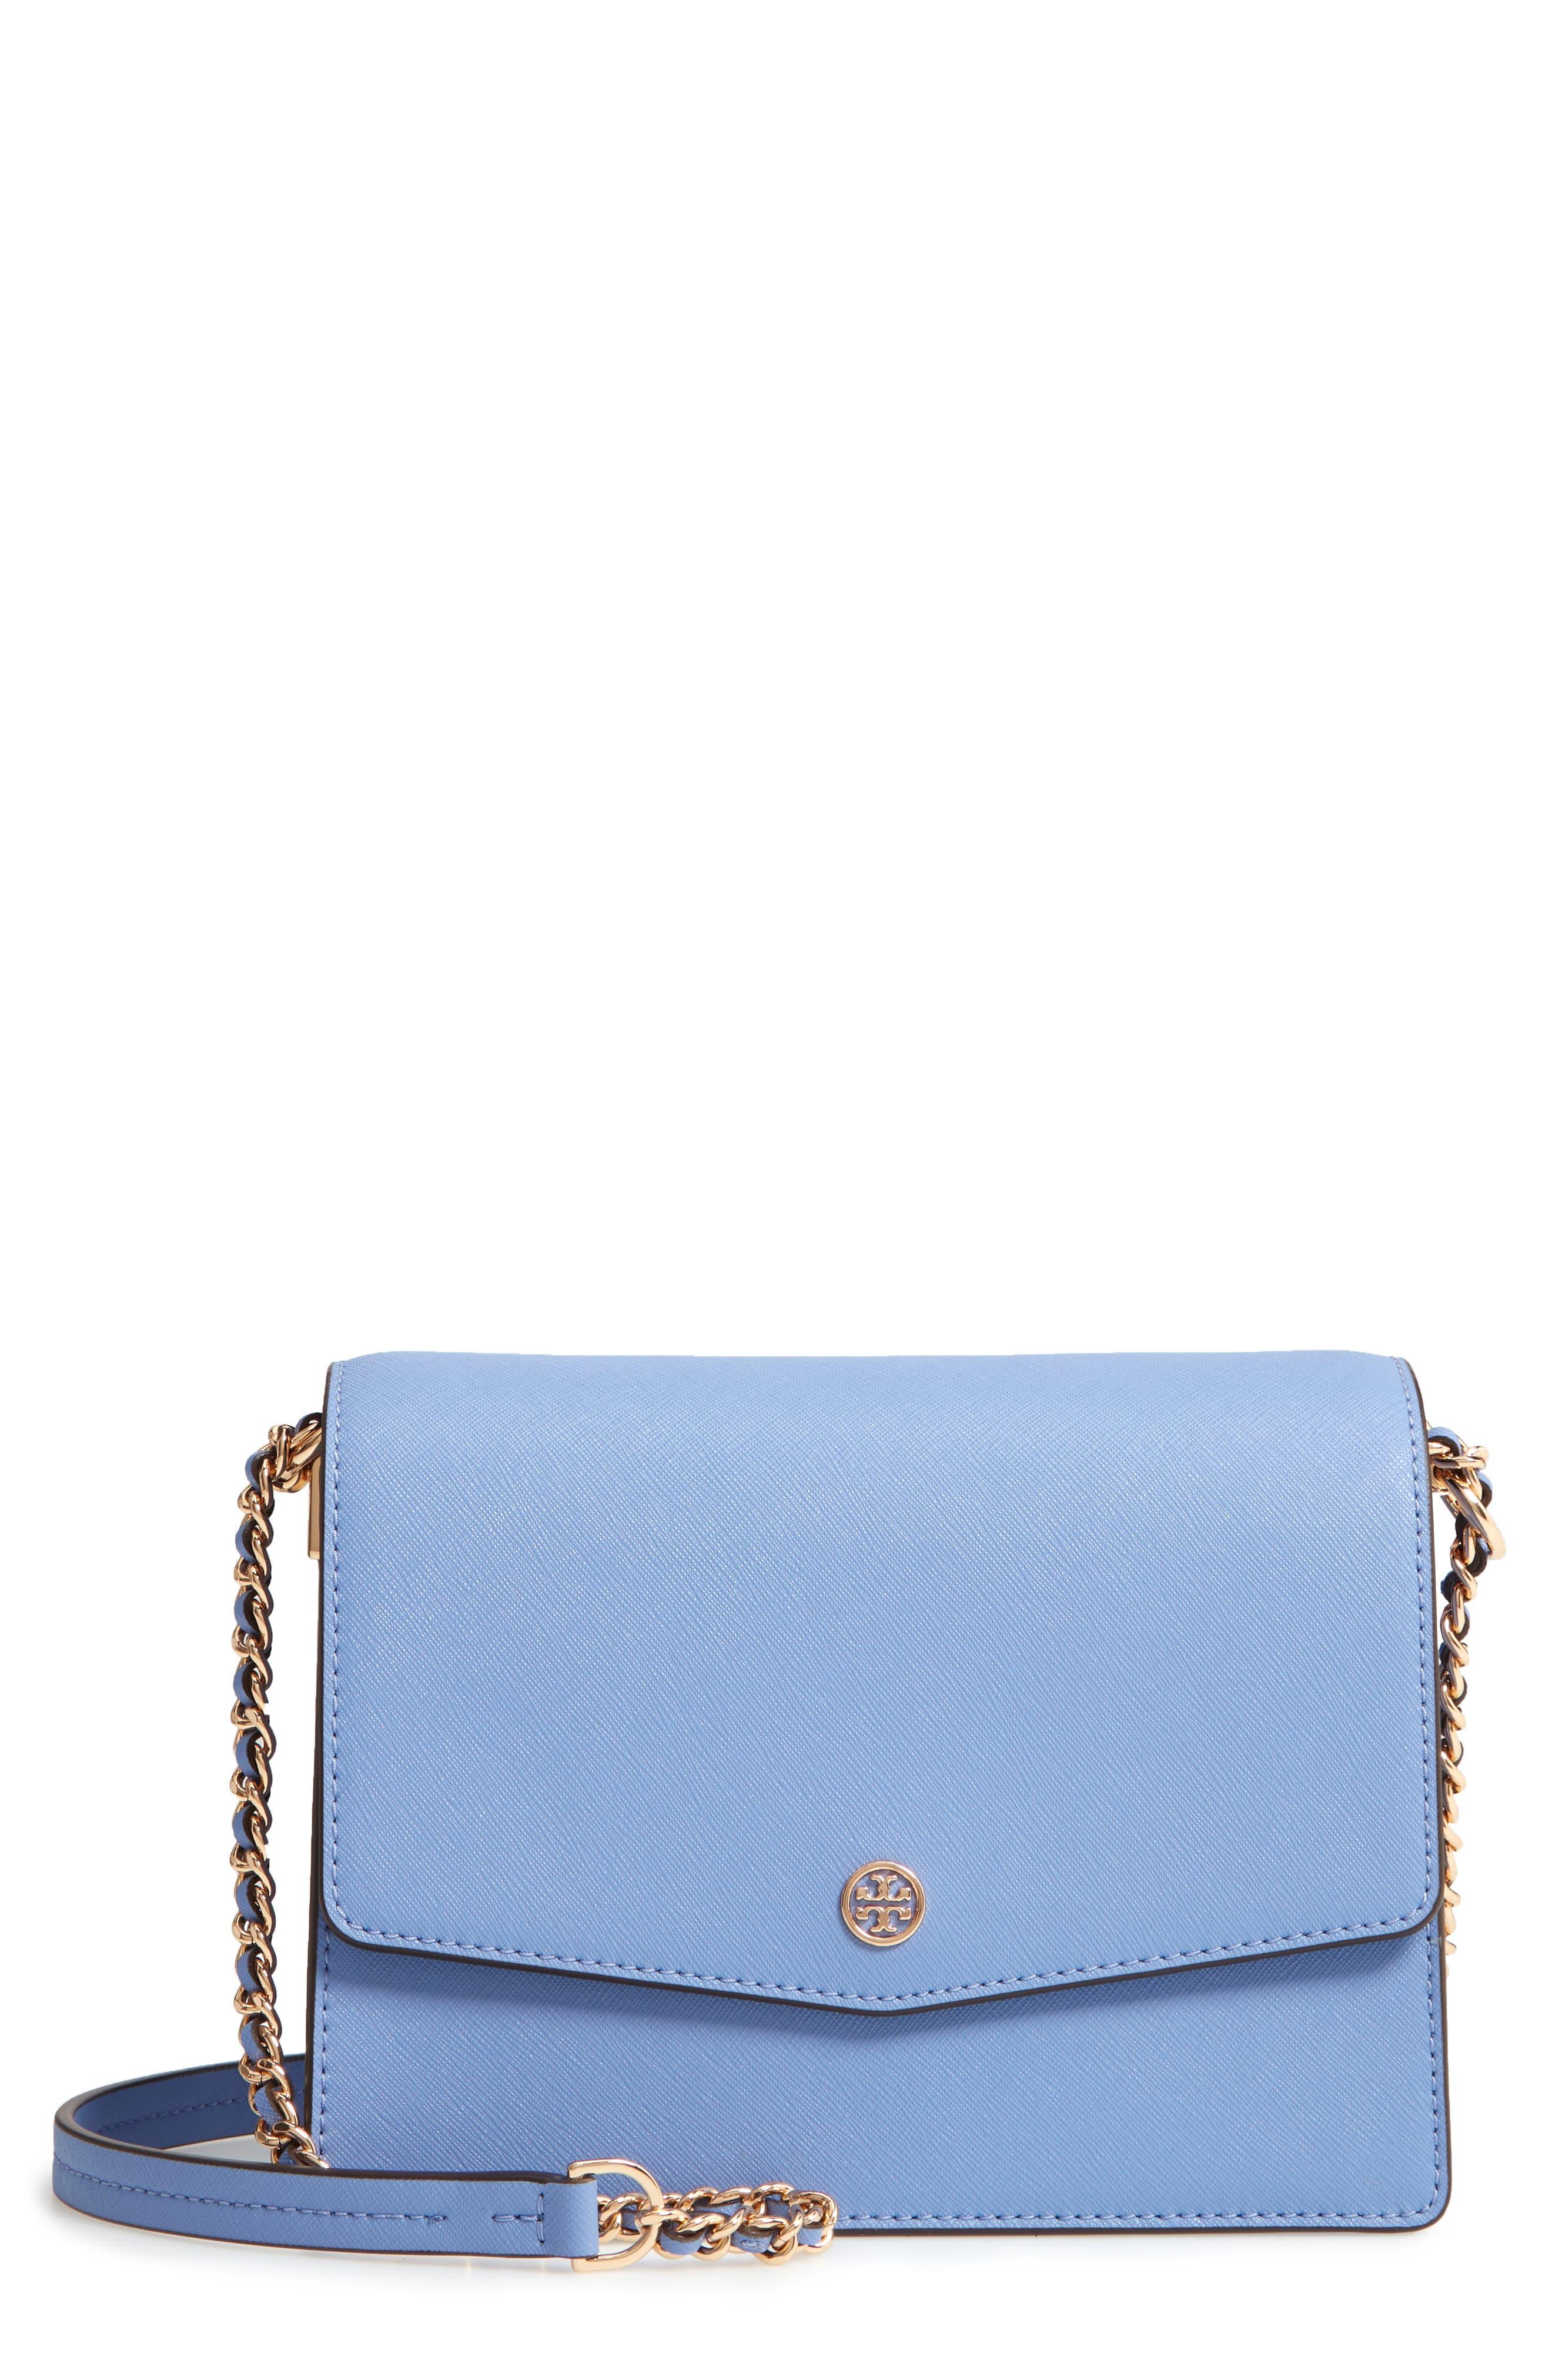 Robinson Convertible Leather Shoulder Bag,                         Main,                         color, Bow Blue